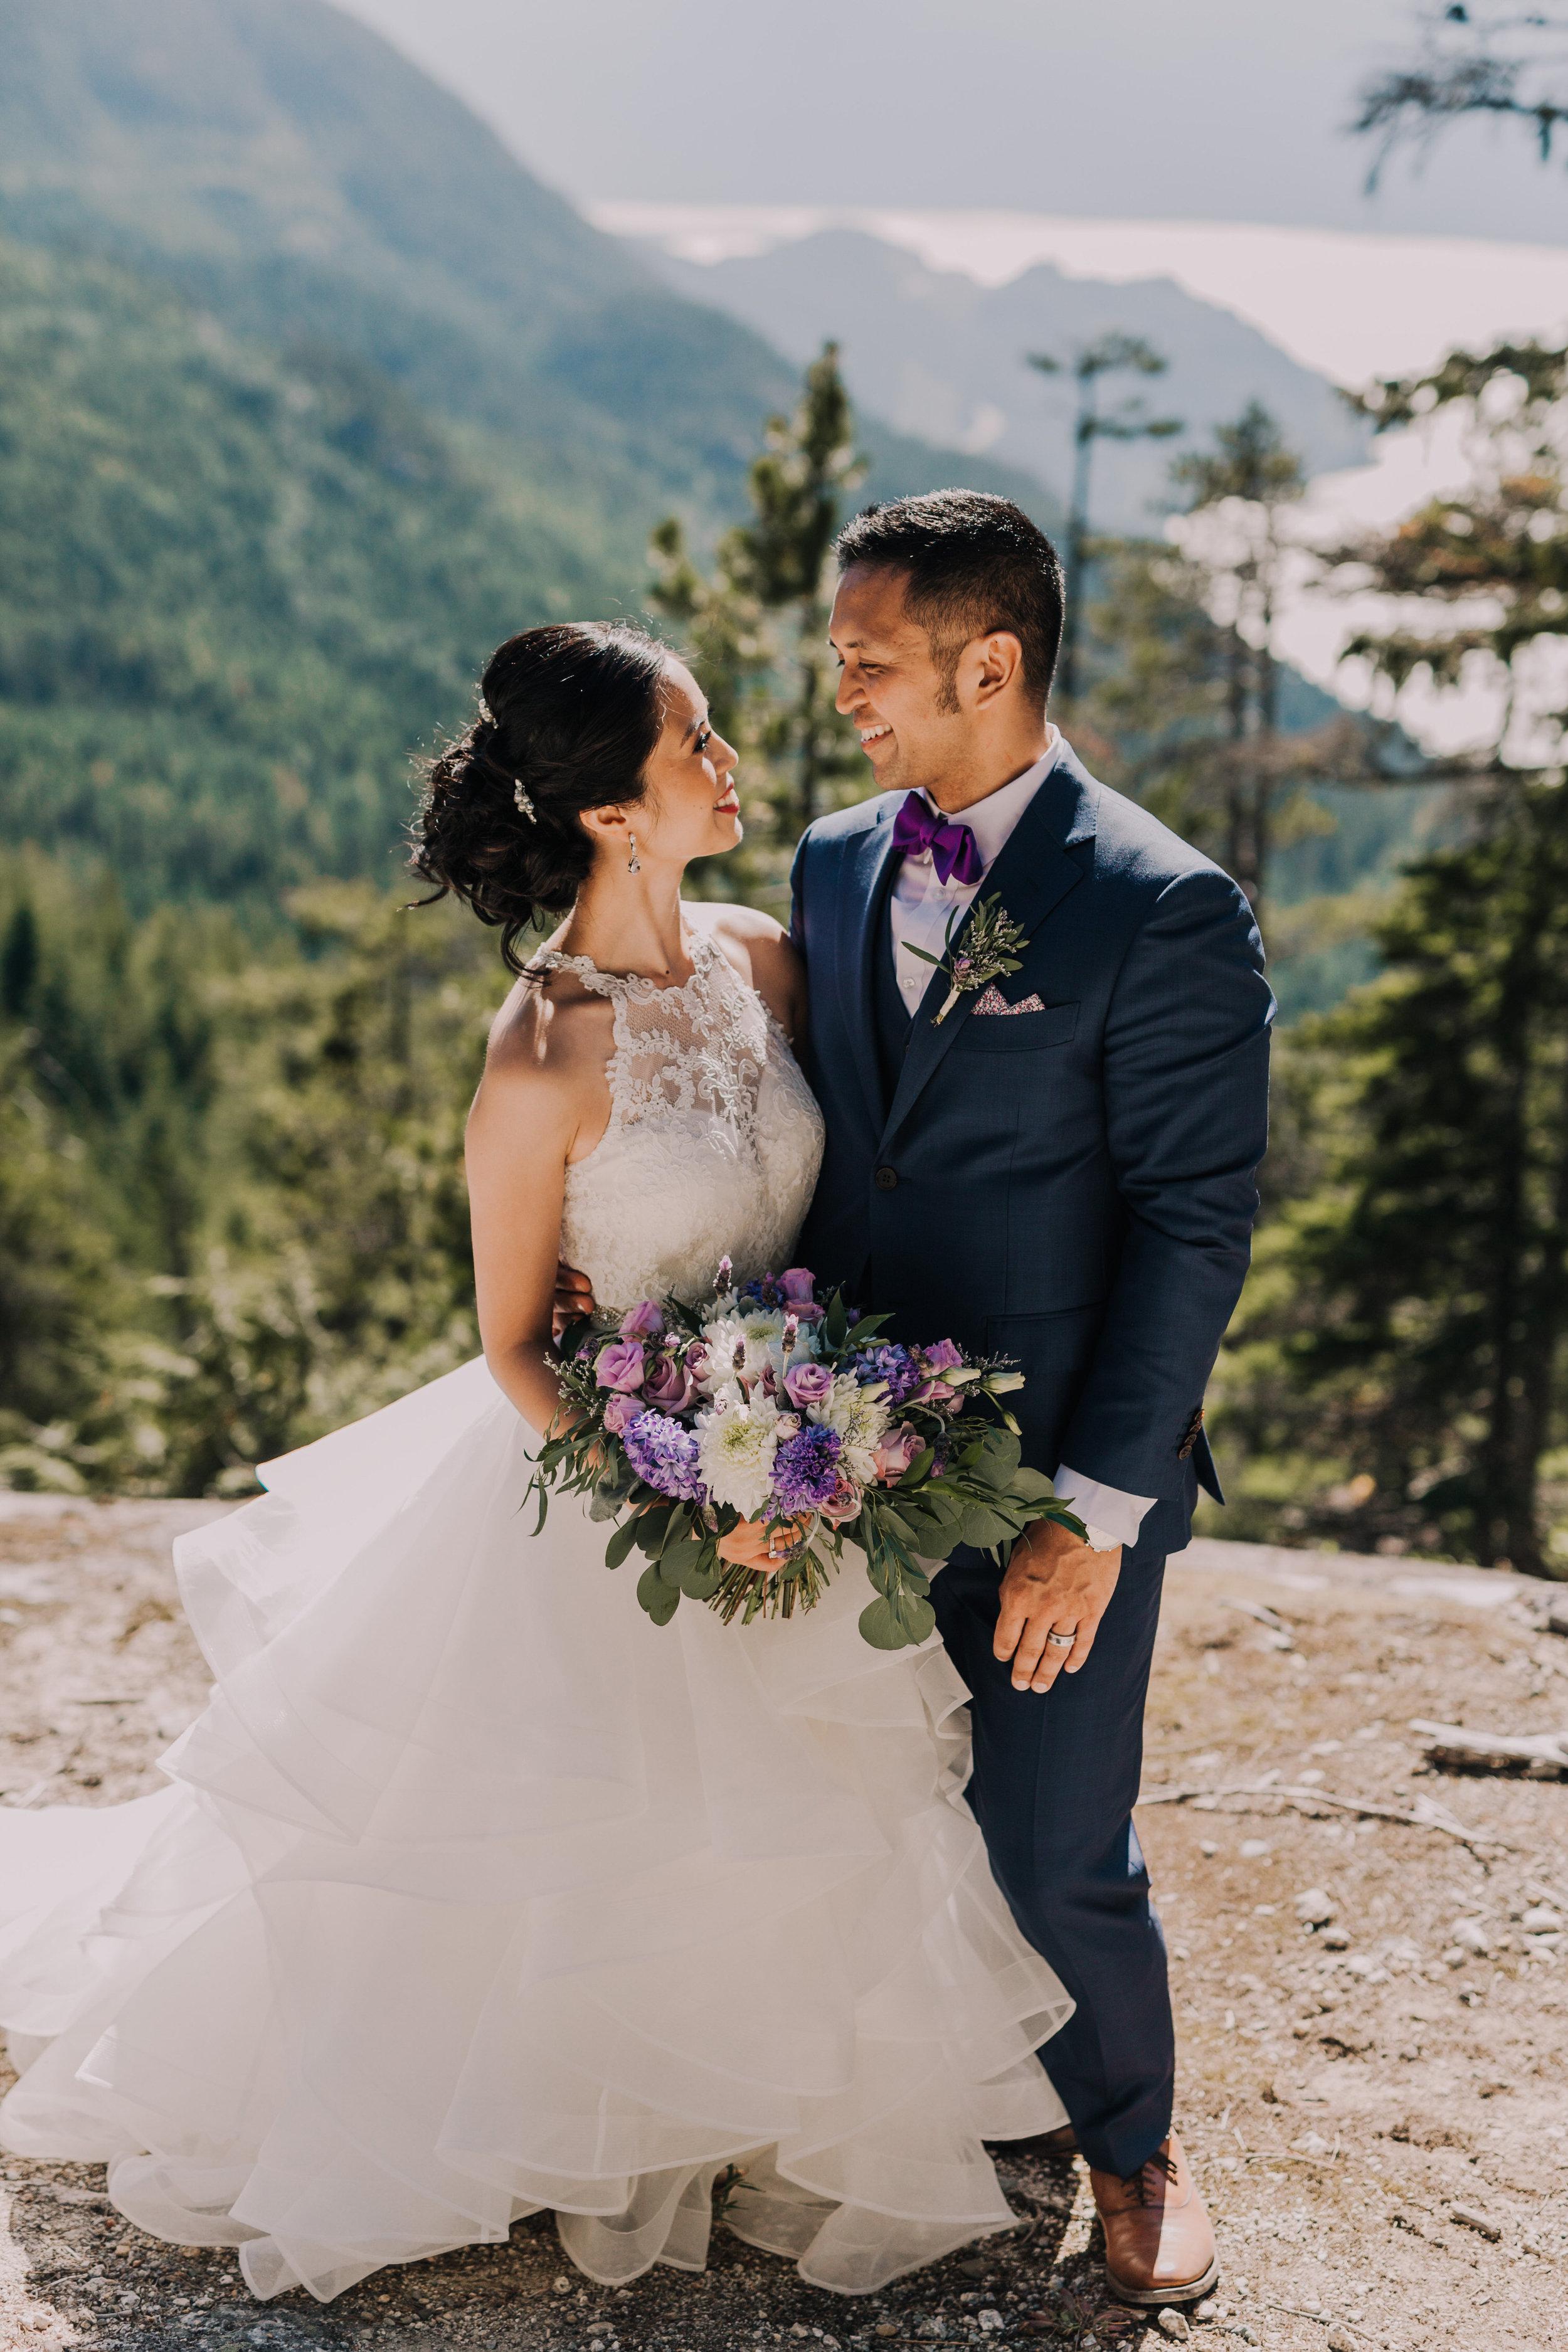 Squamish Wedding Photographer - Sea to Sky Gondola Wedding Photos -  Vancouver Wedding Photographer & Videographer - Sunshine Coast Wedding Photos - Sunshine Coast Wedding Photographer - Jennifer Picard Photography - IMG_3406_1.jpg